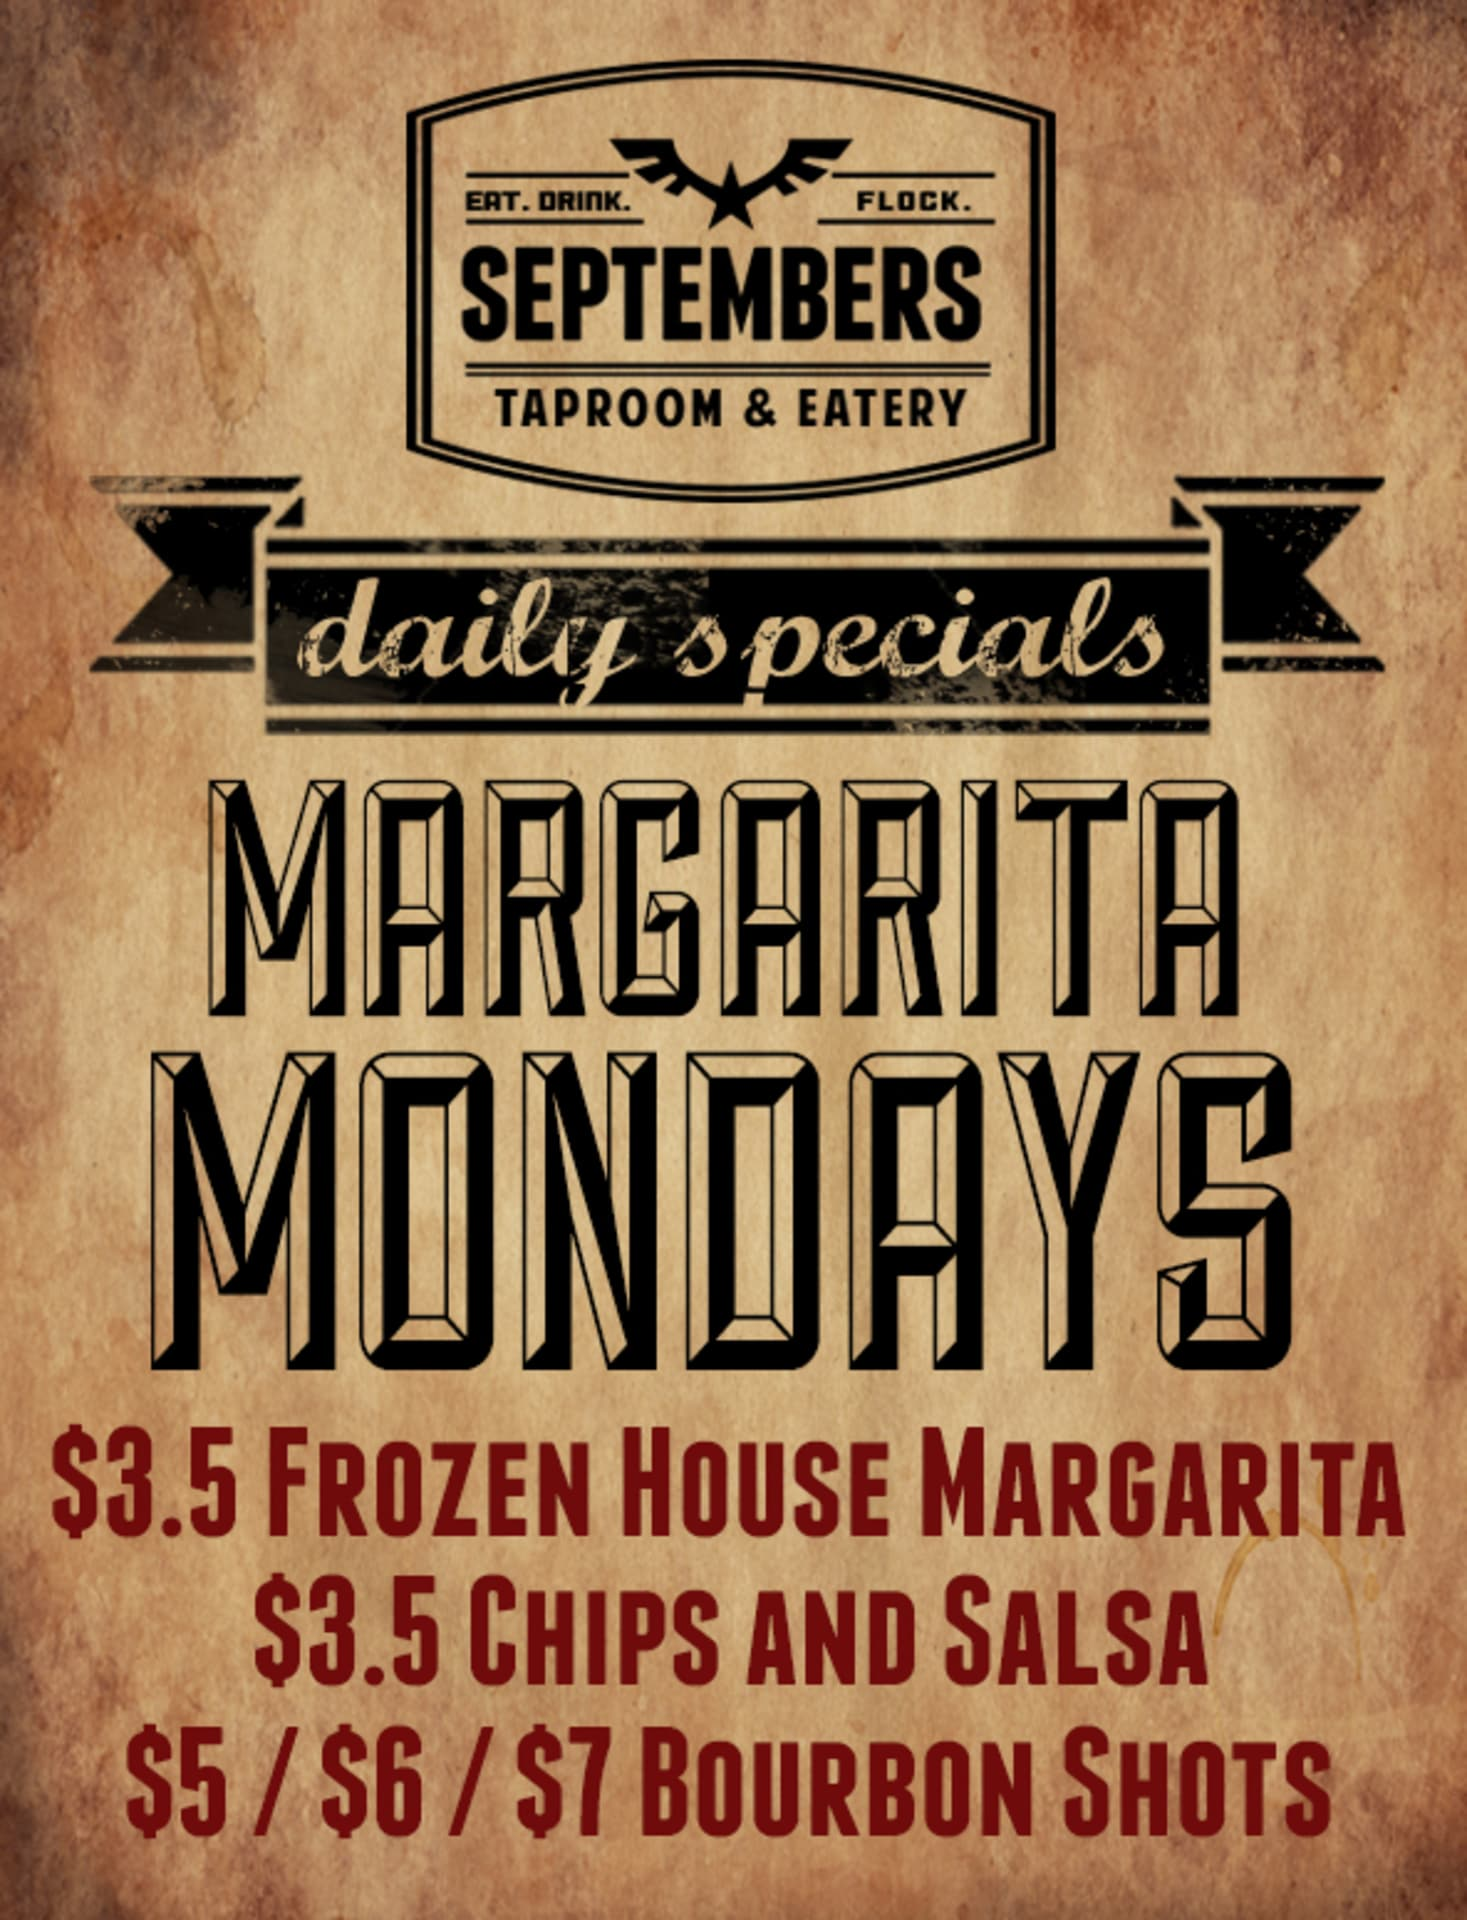 Monday   Margarita Monday